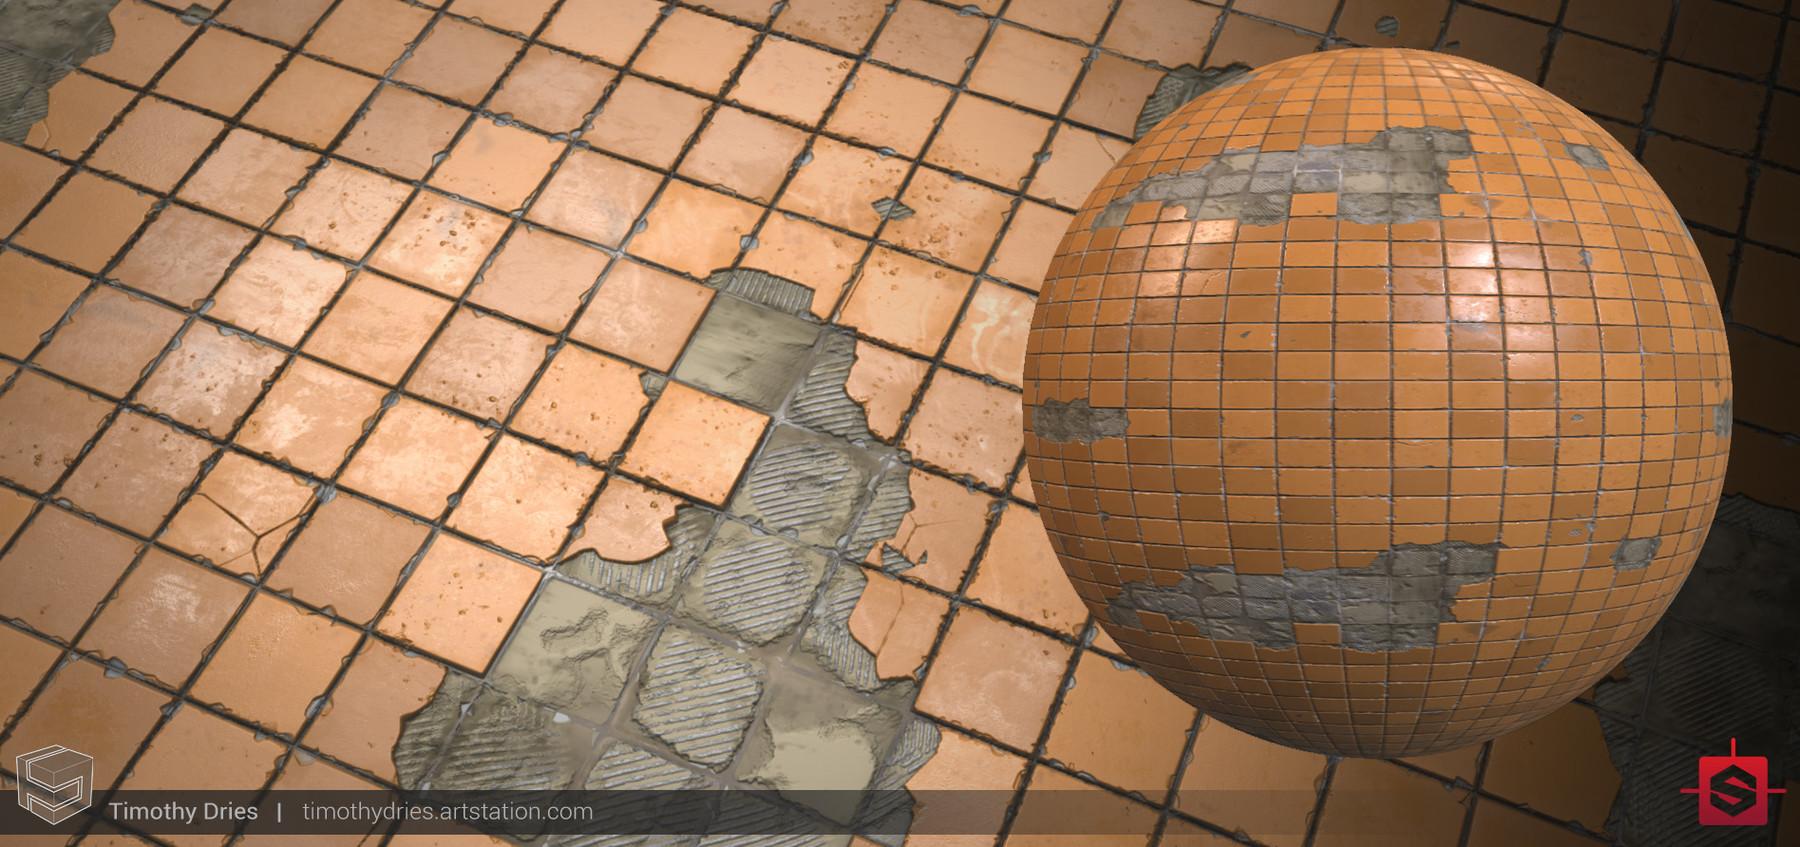 Tiles orange